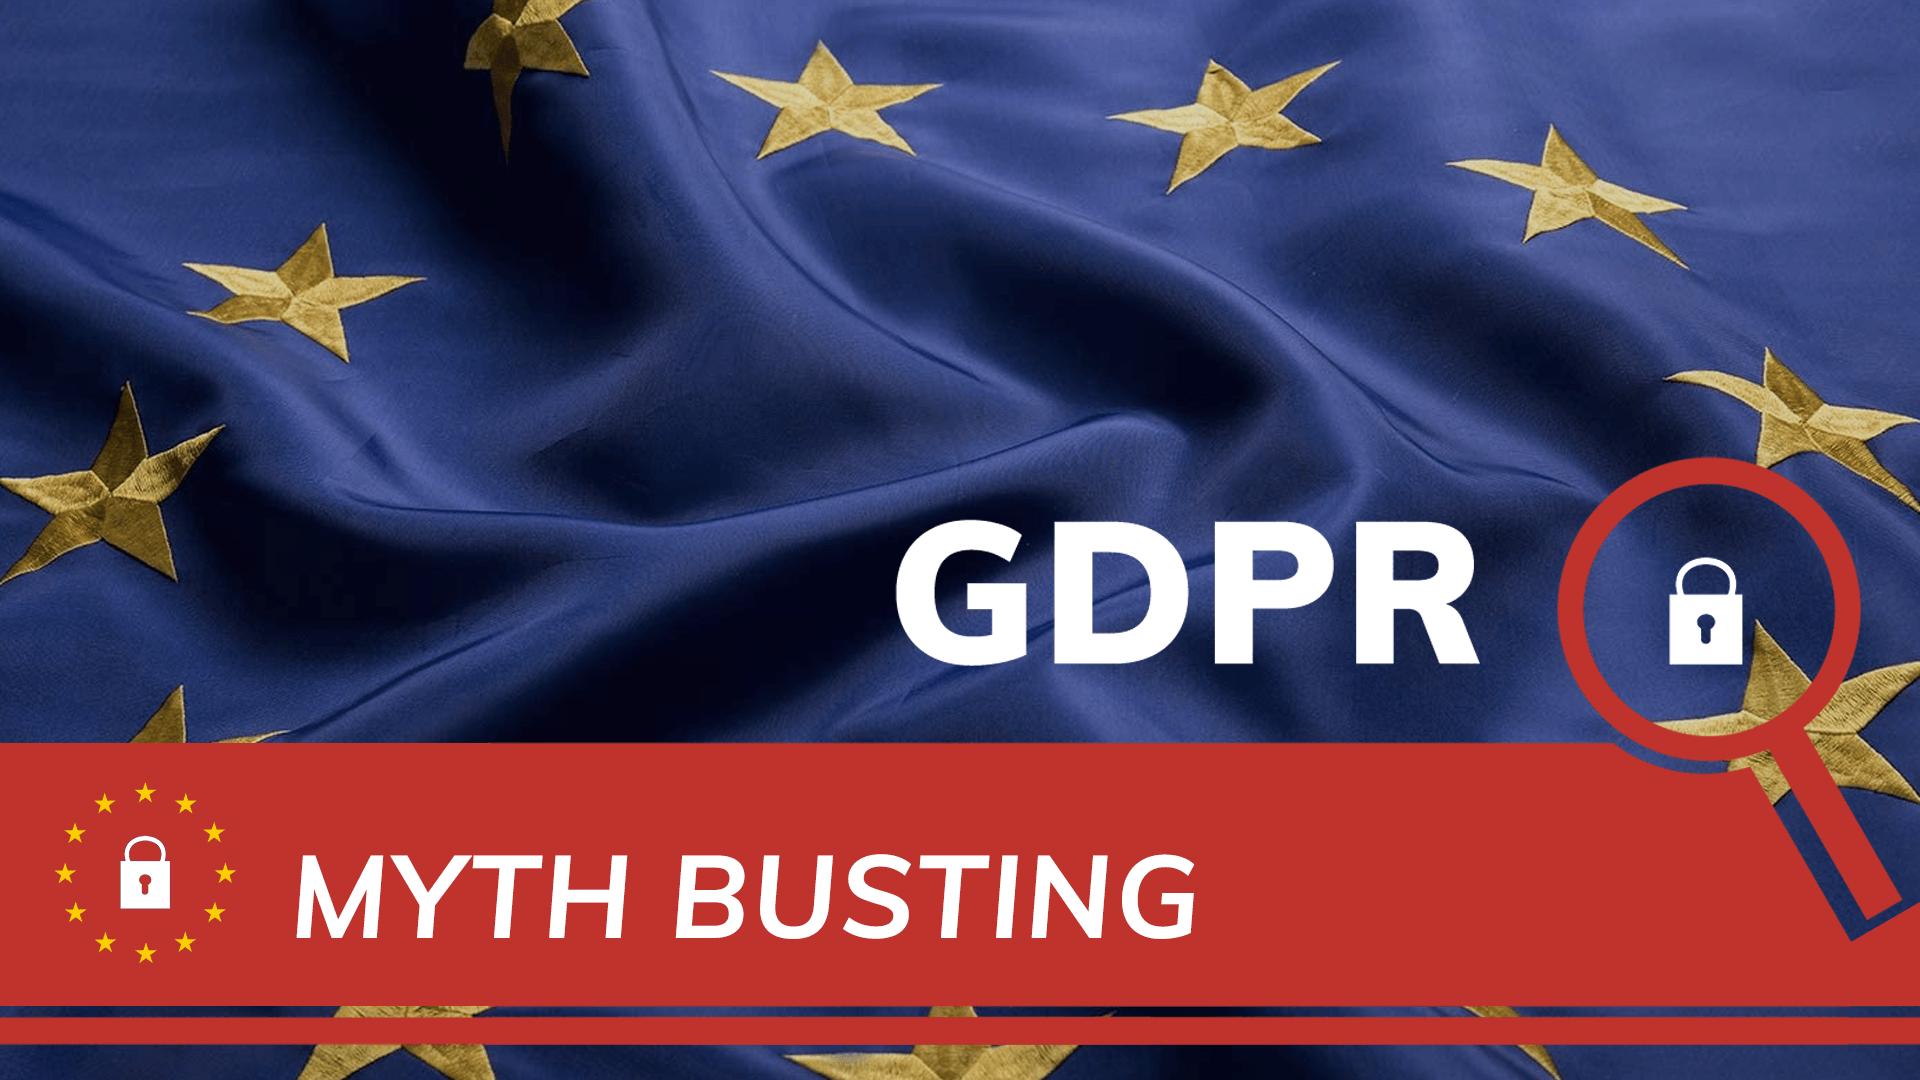 GDPR Myth-busting